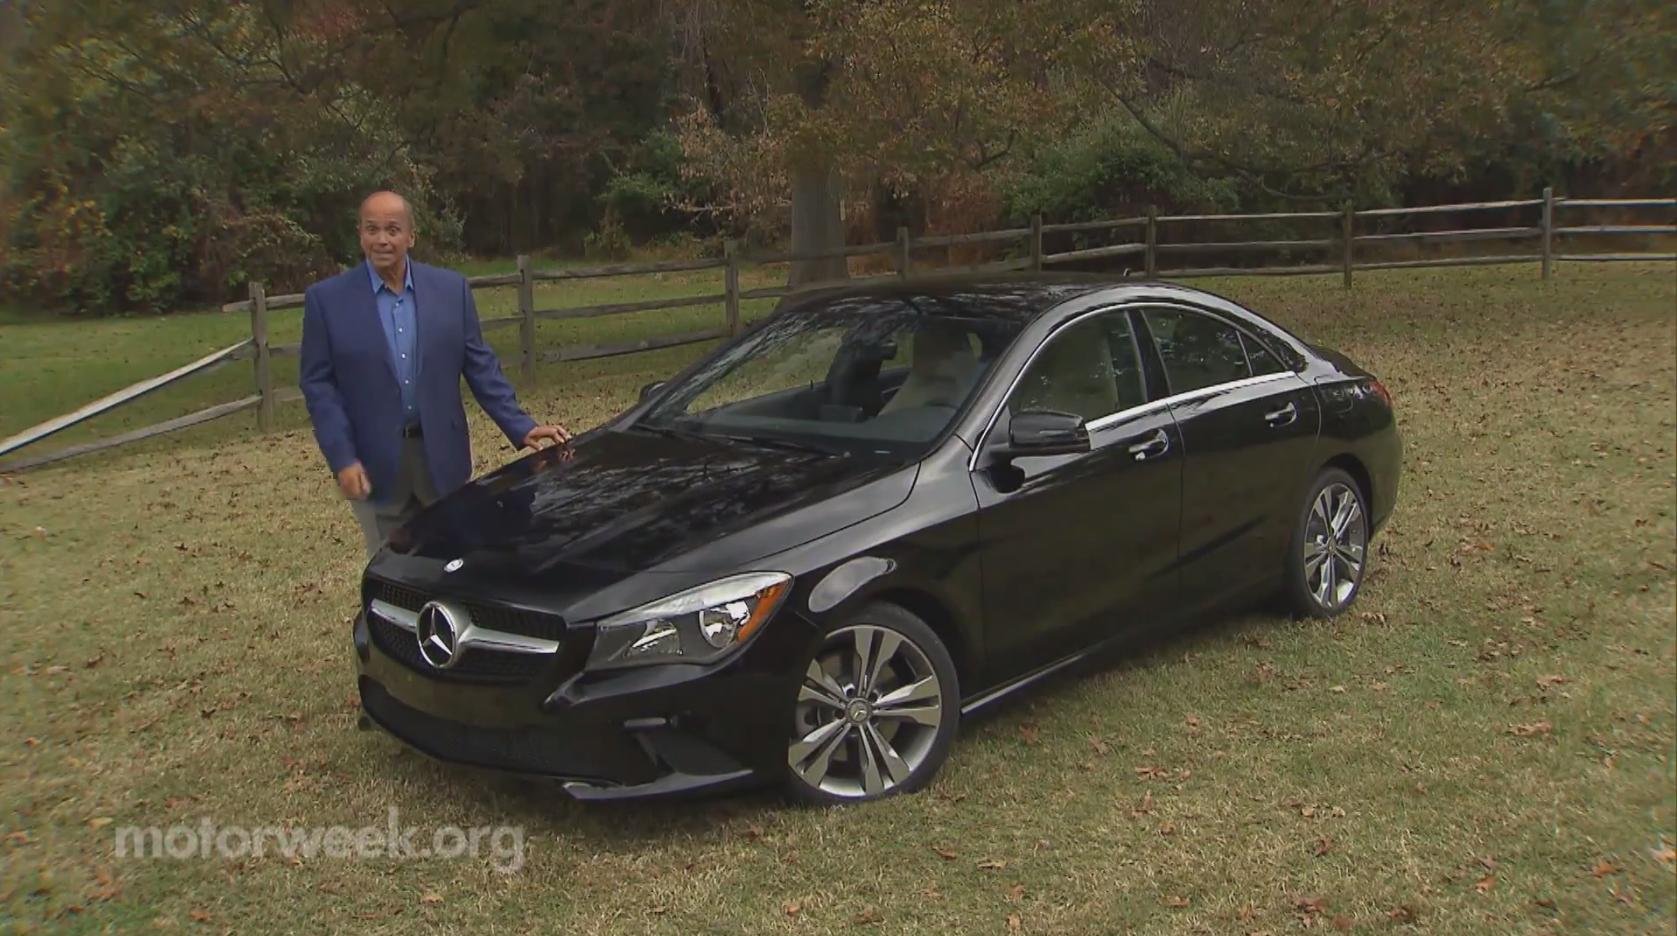 Mercedes-Benz CLA 250 Gets Reviewed by MotorWeek - autoevolution